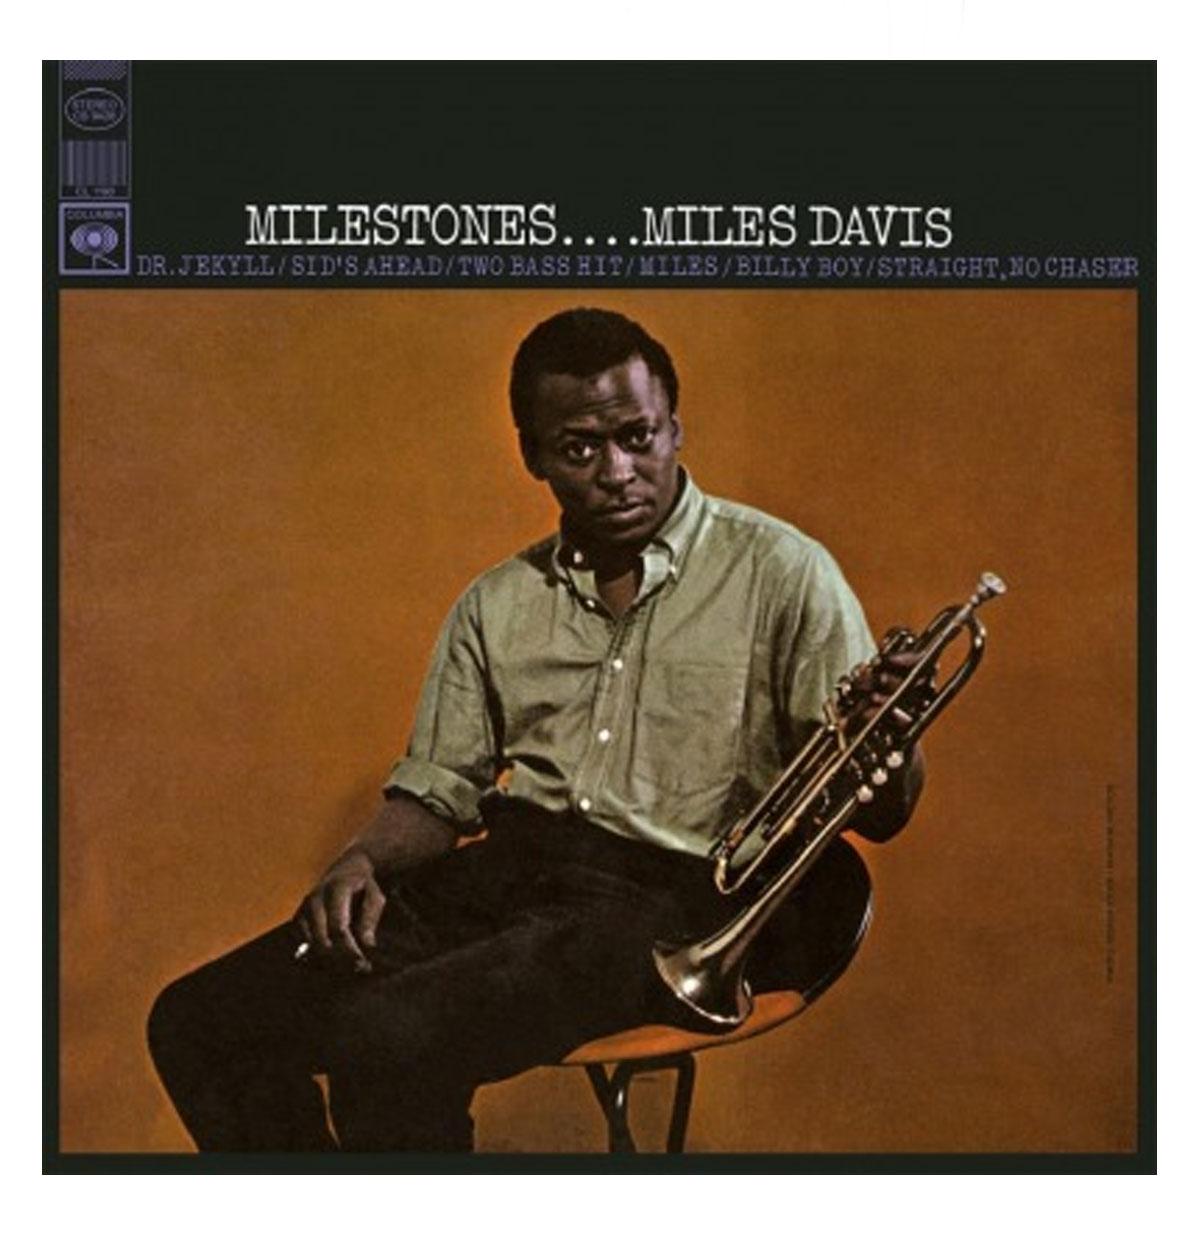 Miles Davis - Milestones -Stereo- LP